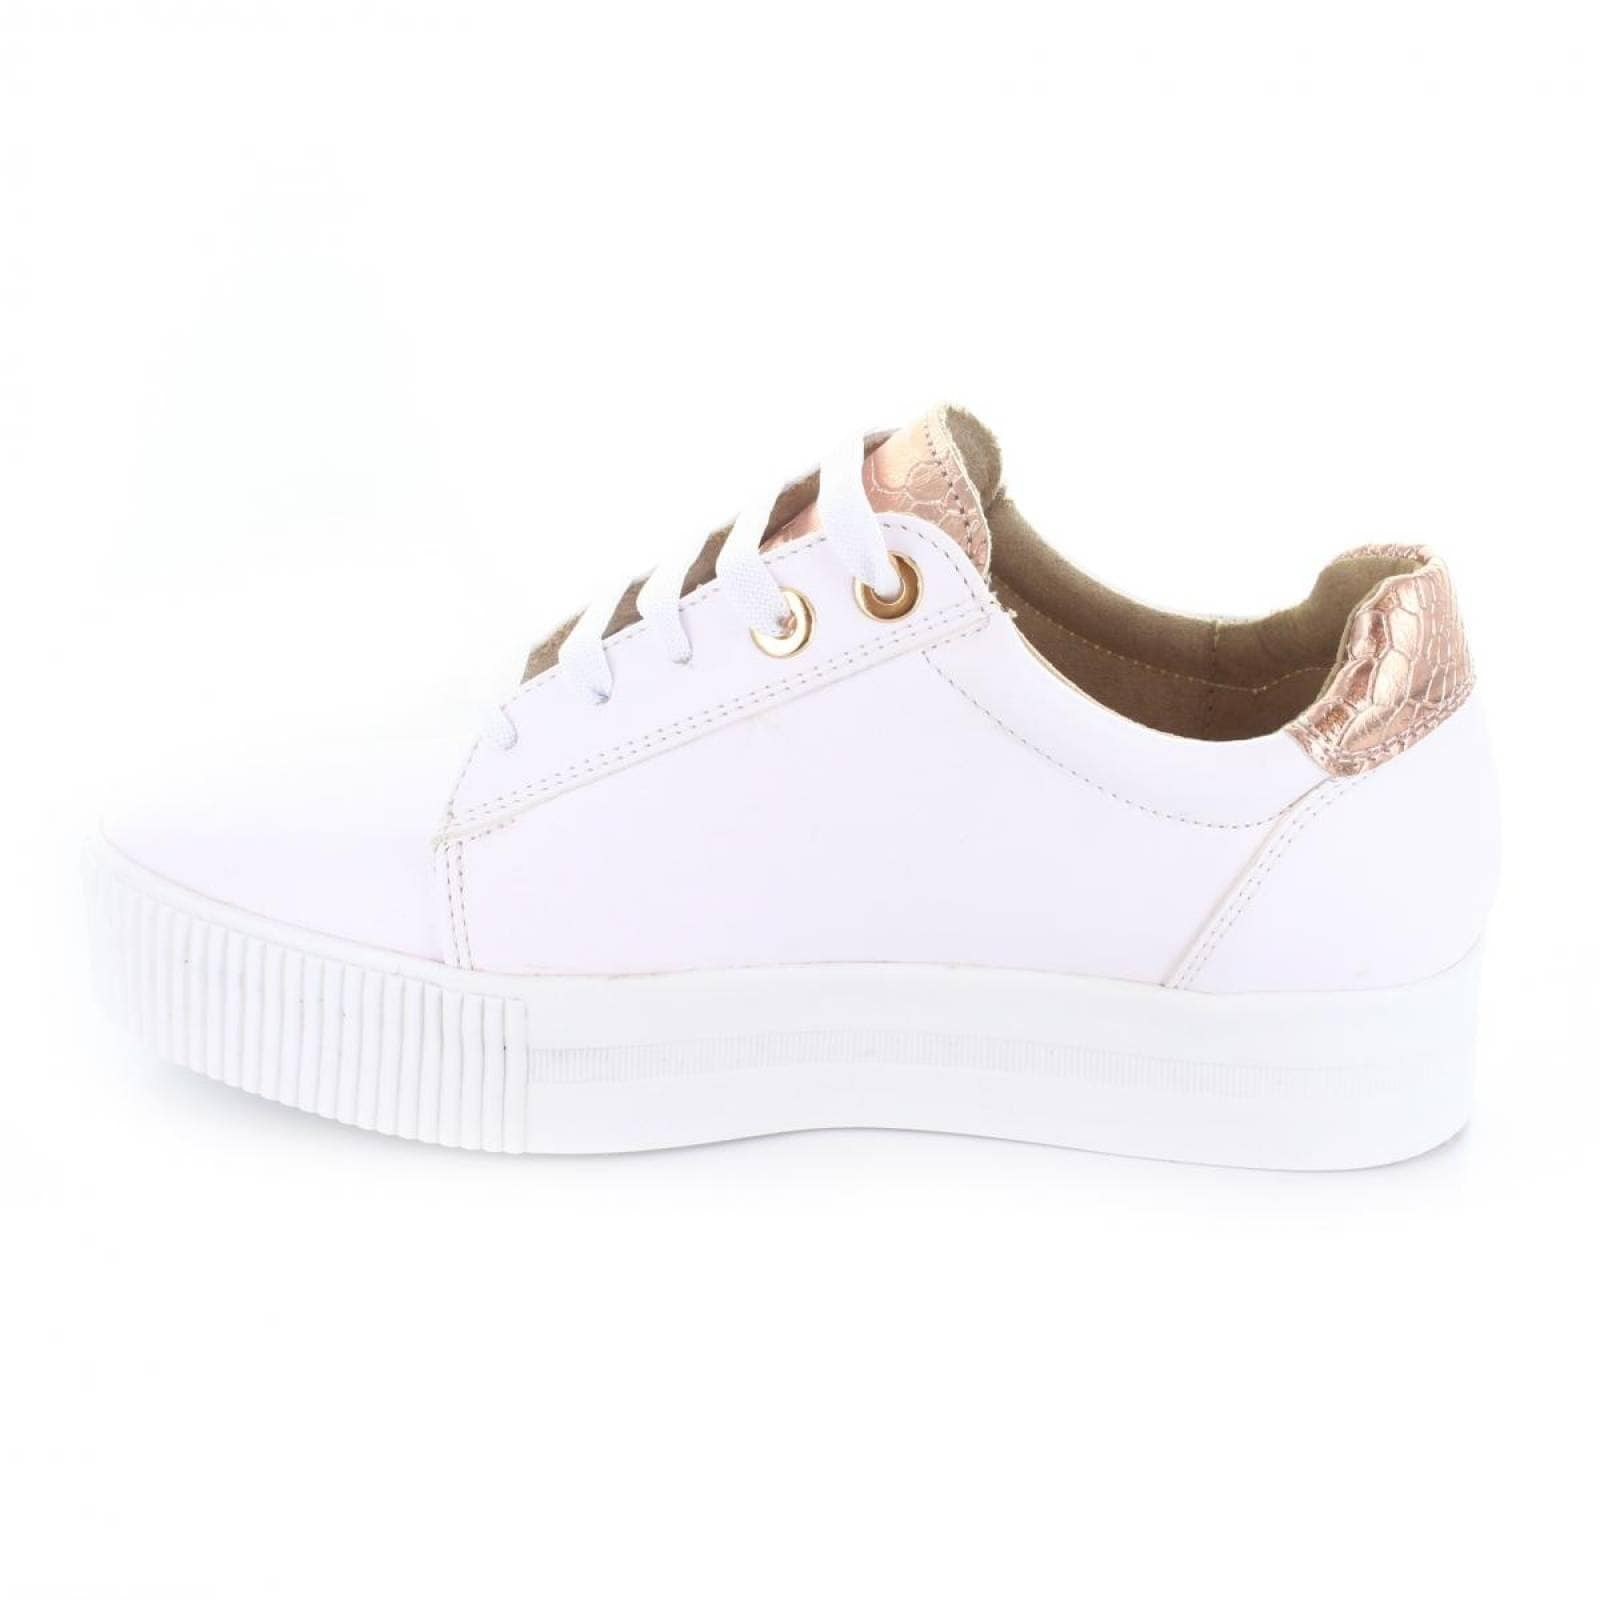 Tenis para Mujer Brantano 2398 046435 Color Blanco